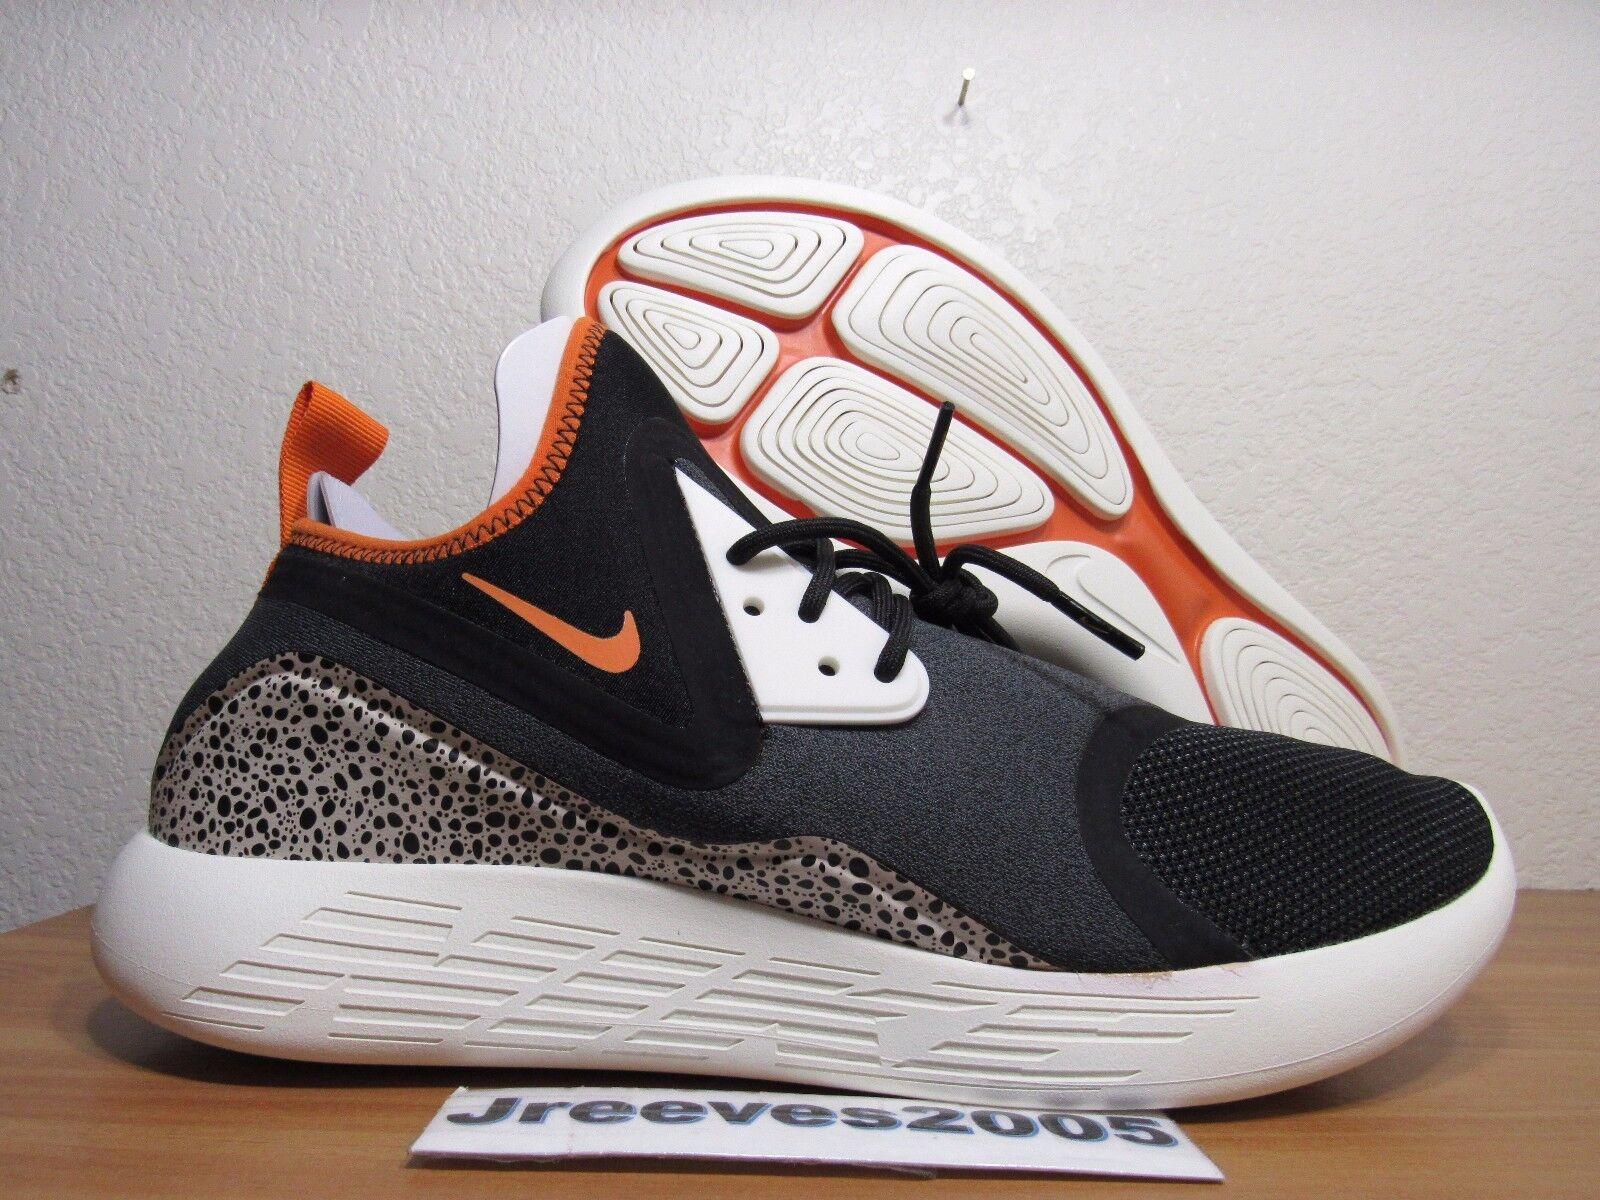 NEW Nike Lunarcharge BN SAFARI Sz 13 100% Authentic 933811 081